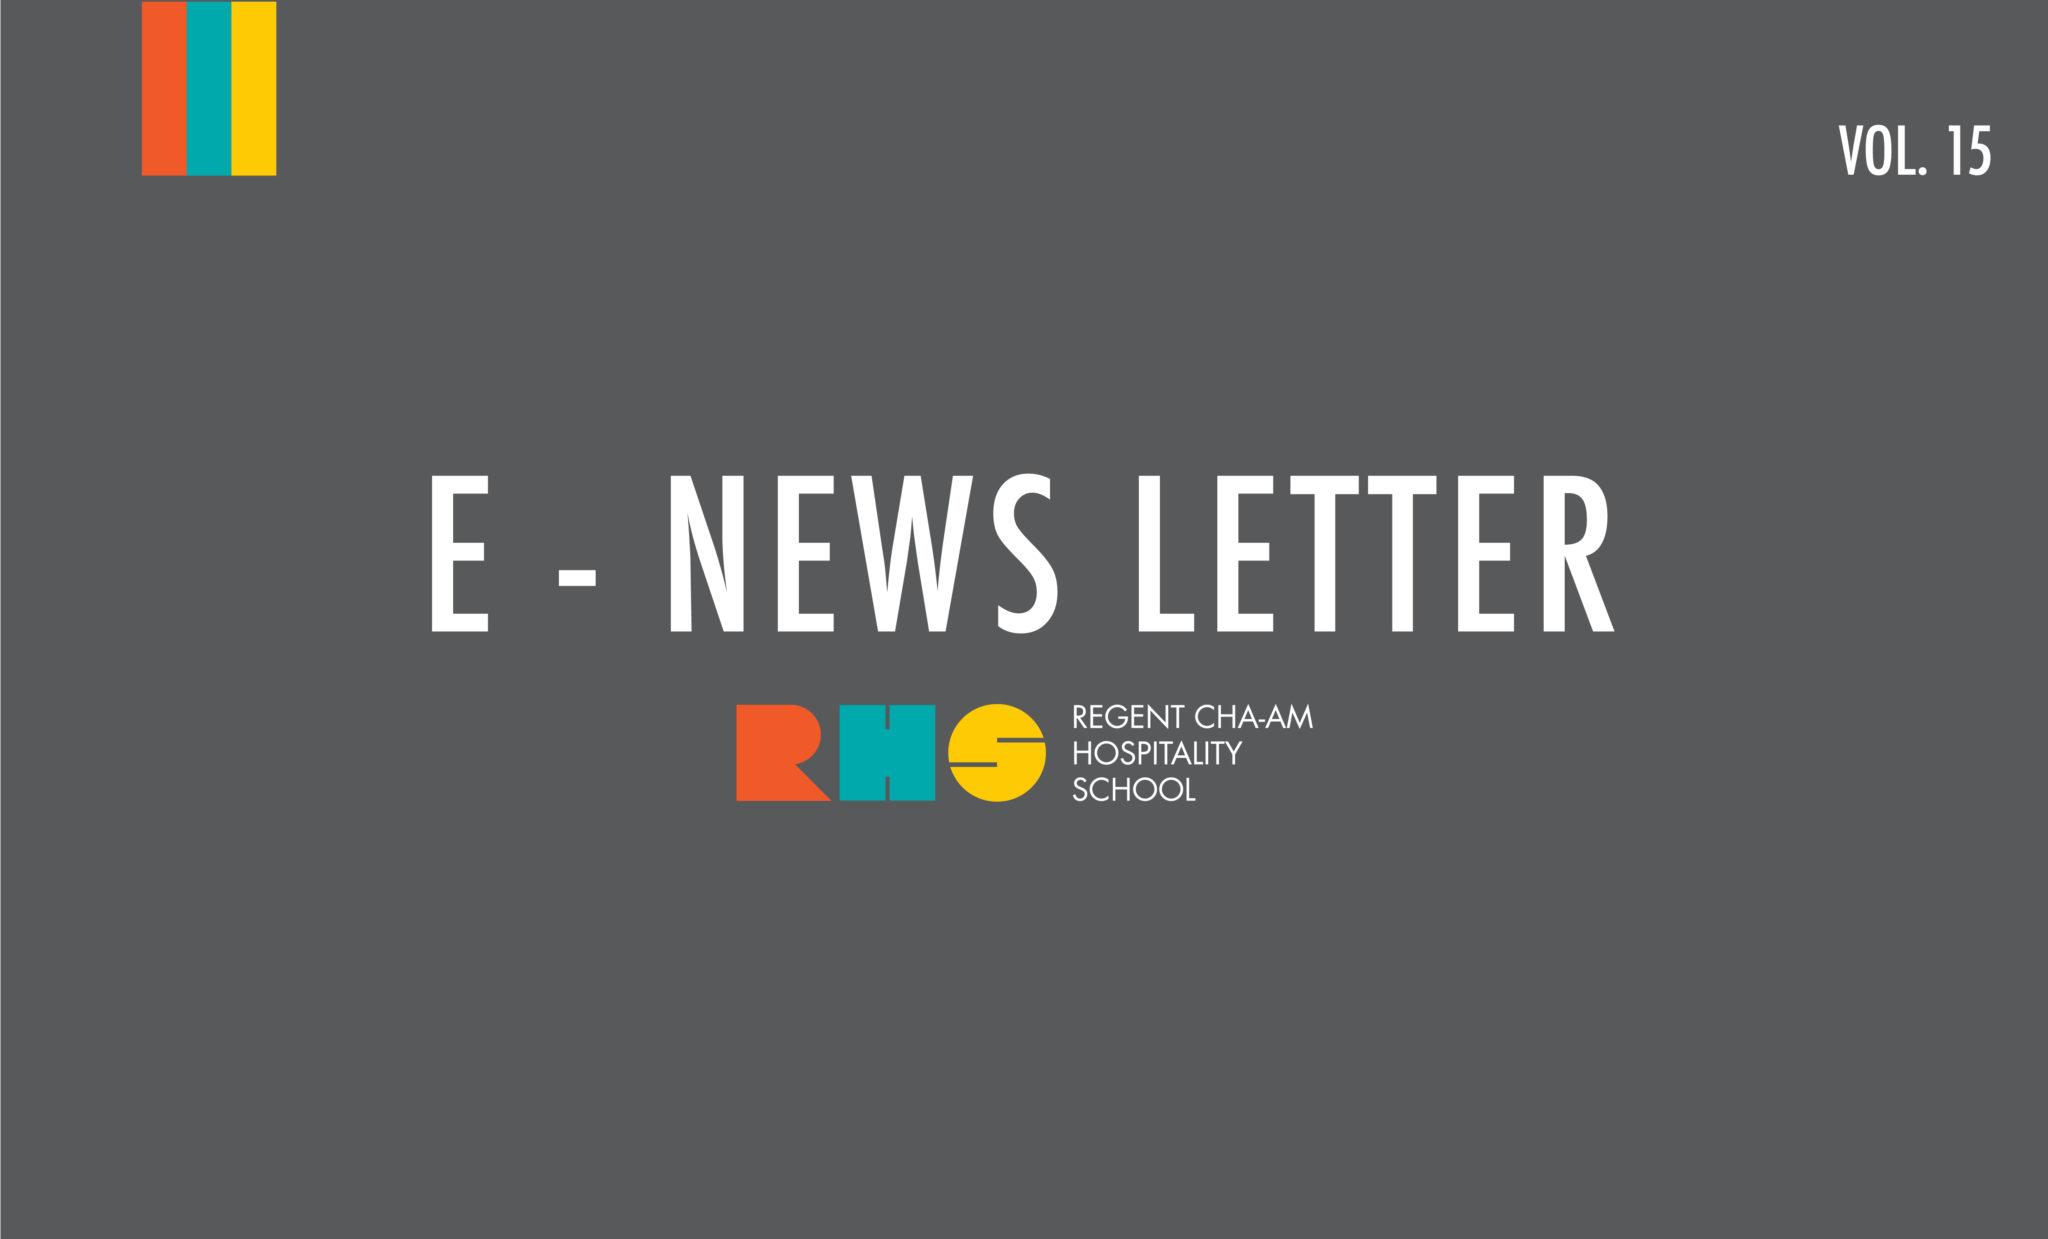 RHS E-News Letter Vol.15